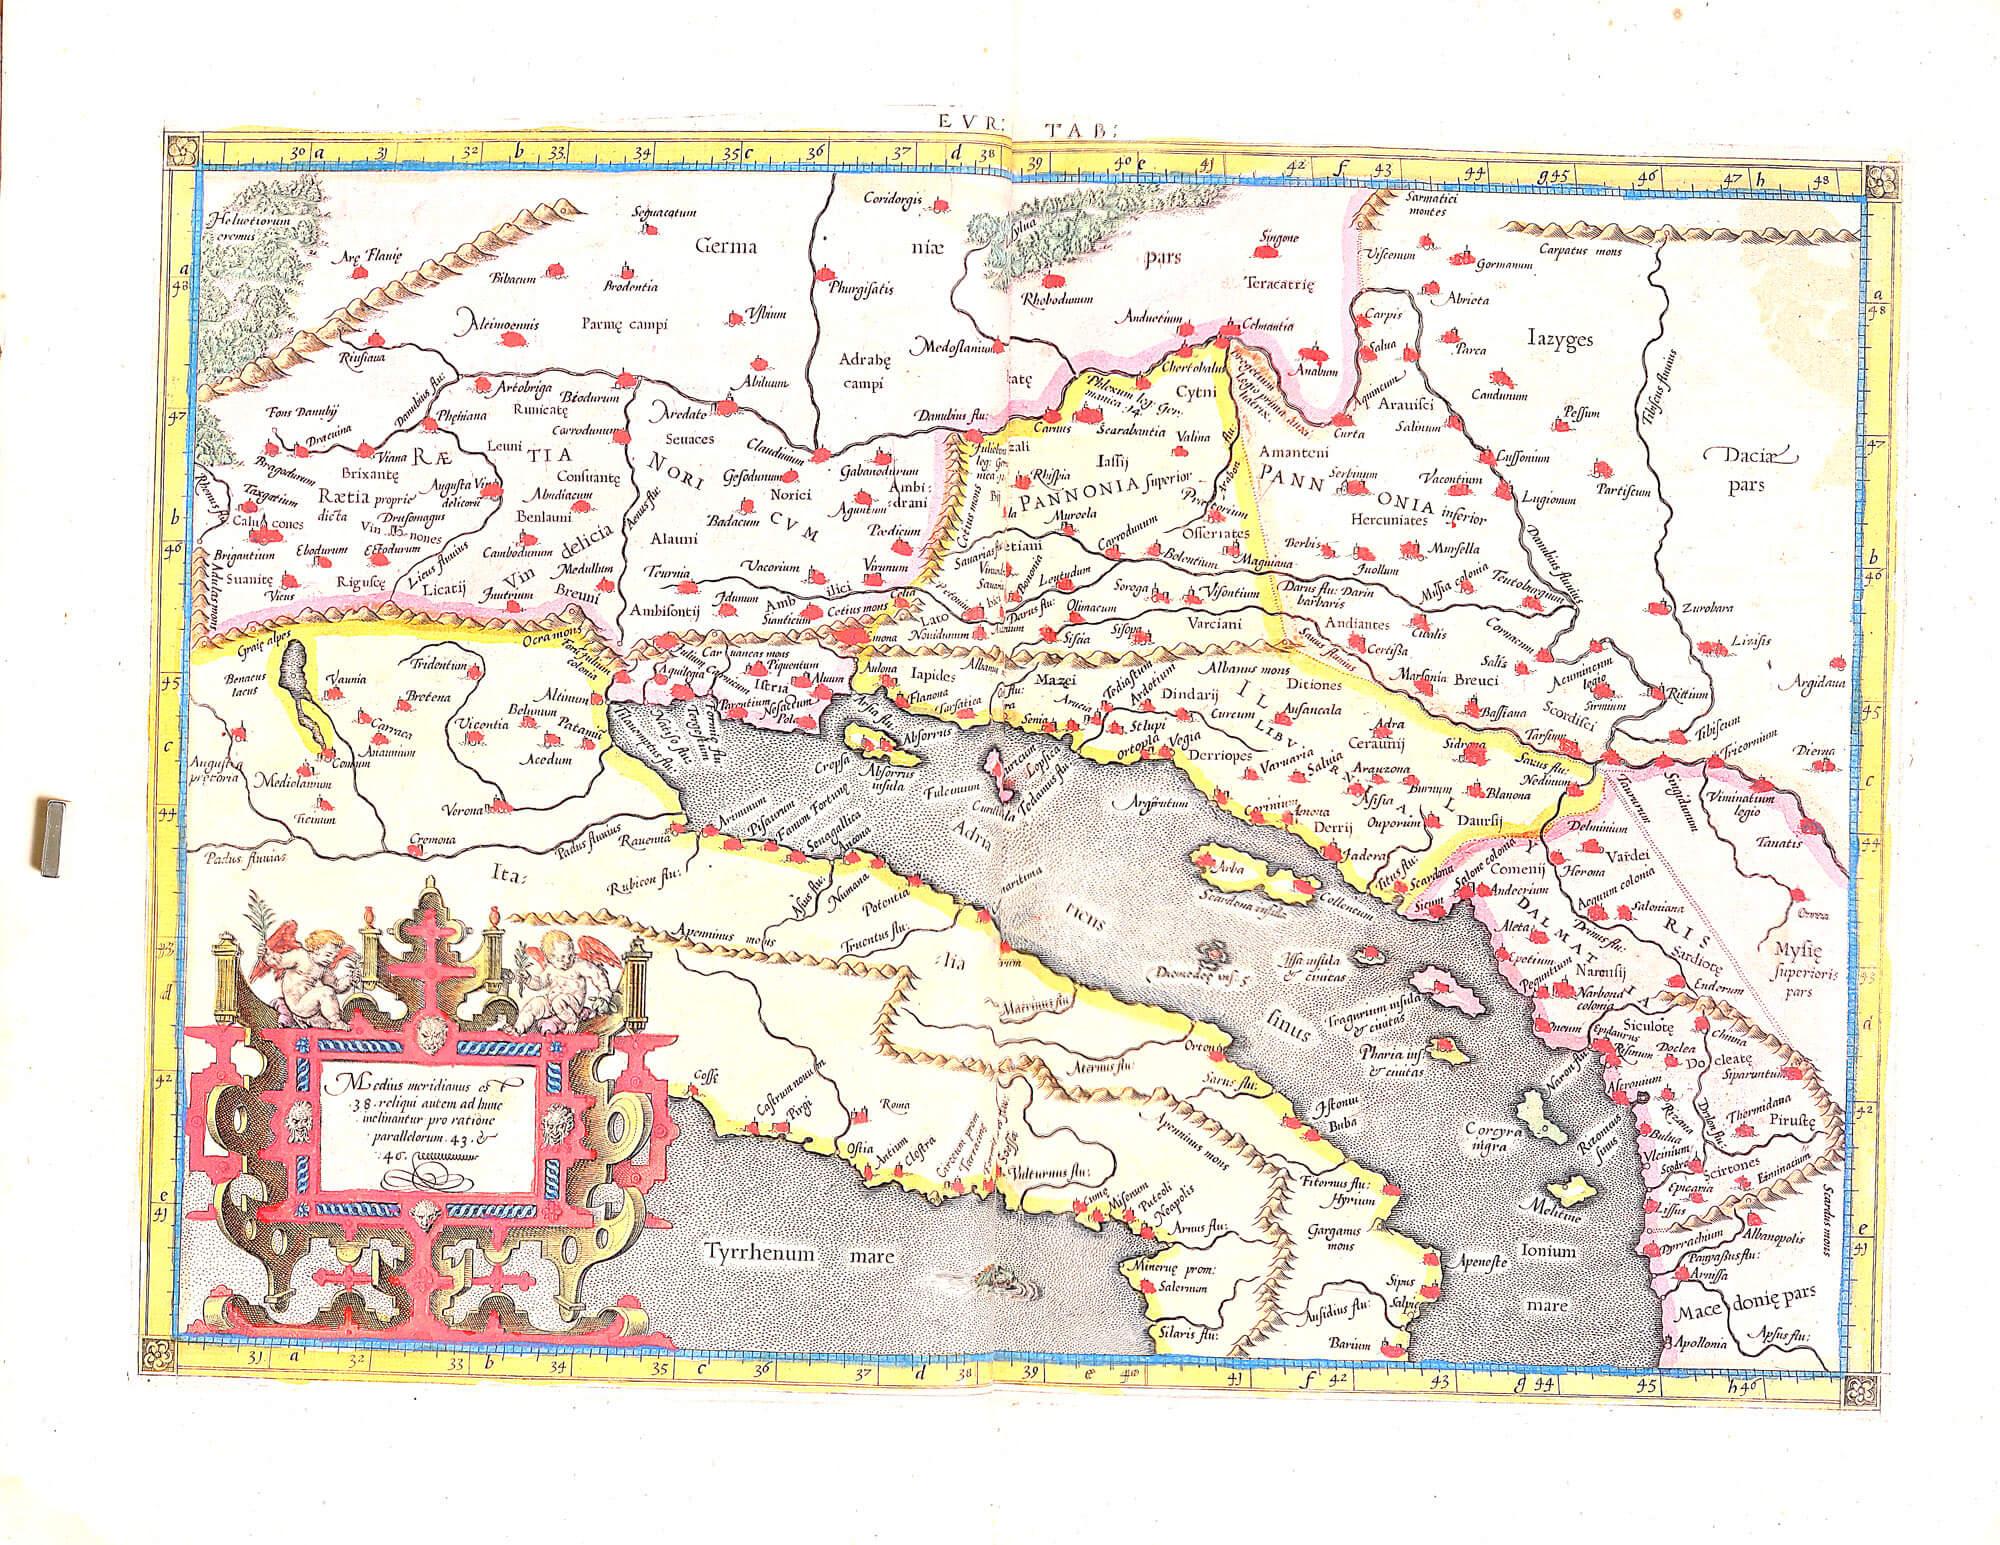 World atlas c ptolomy peter bertius 1618 l brown collection dd aa 08 06 italy balkans gumiabroncs Choice Image